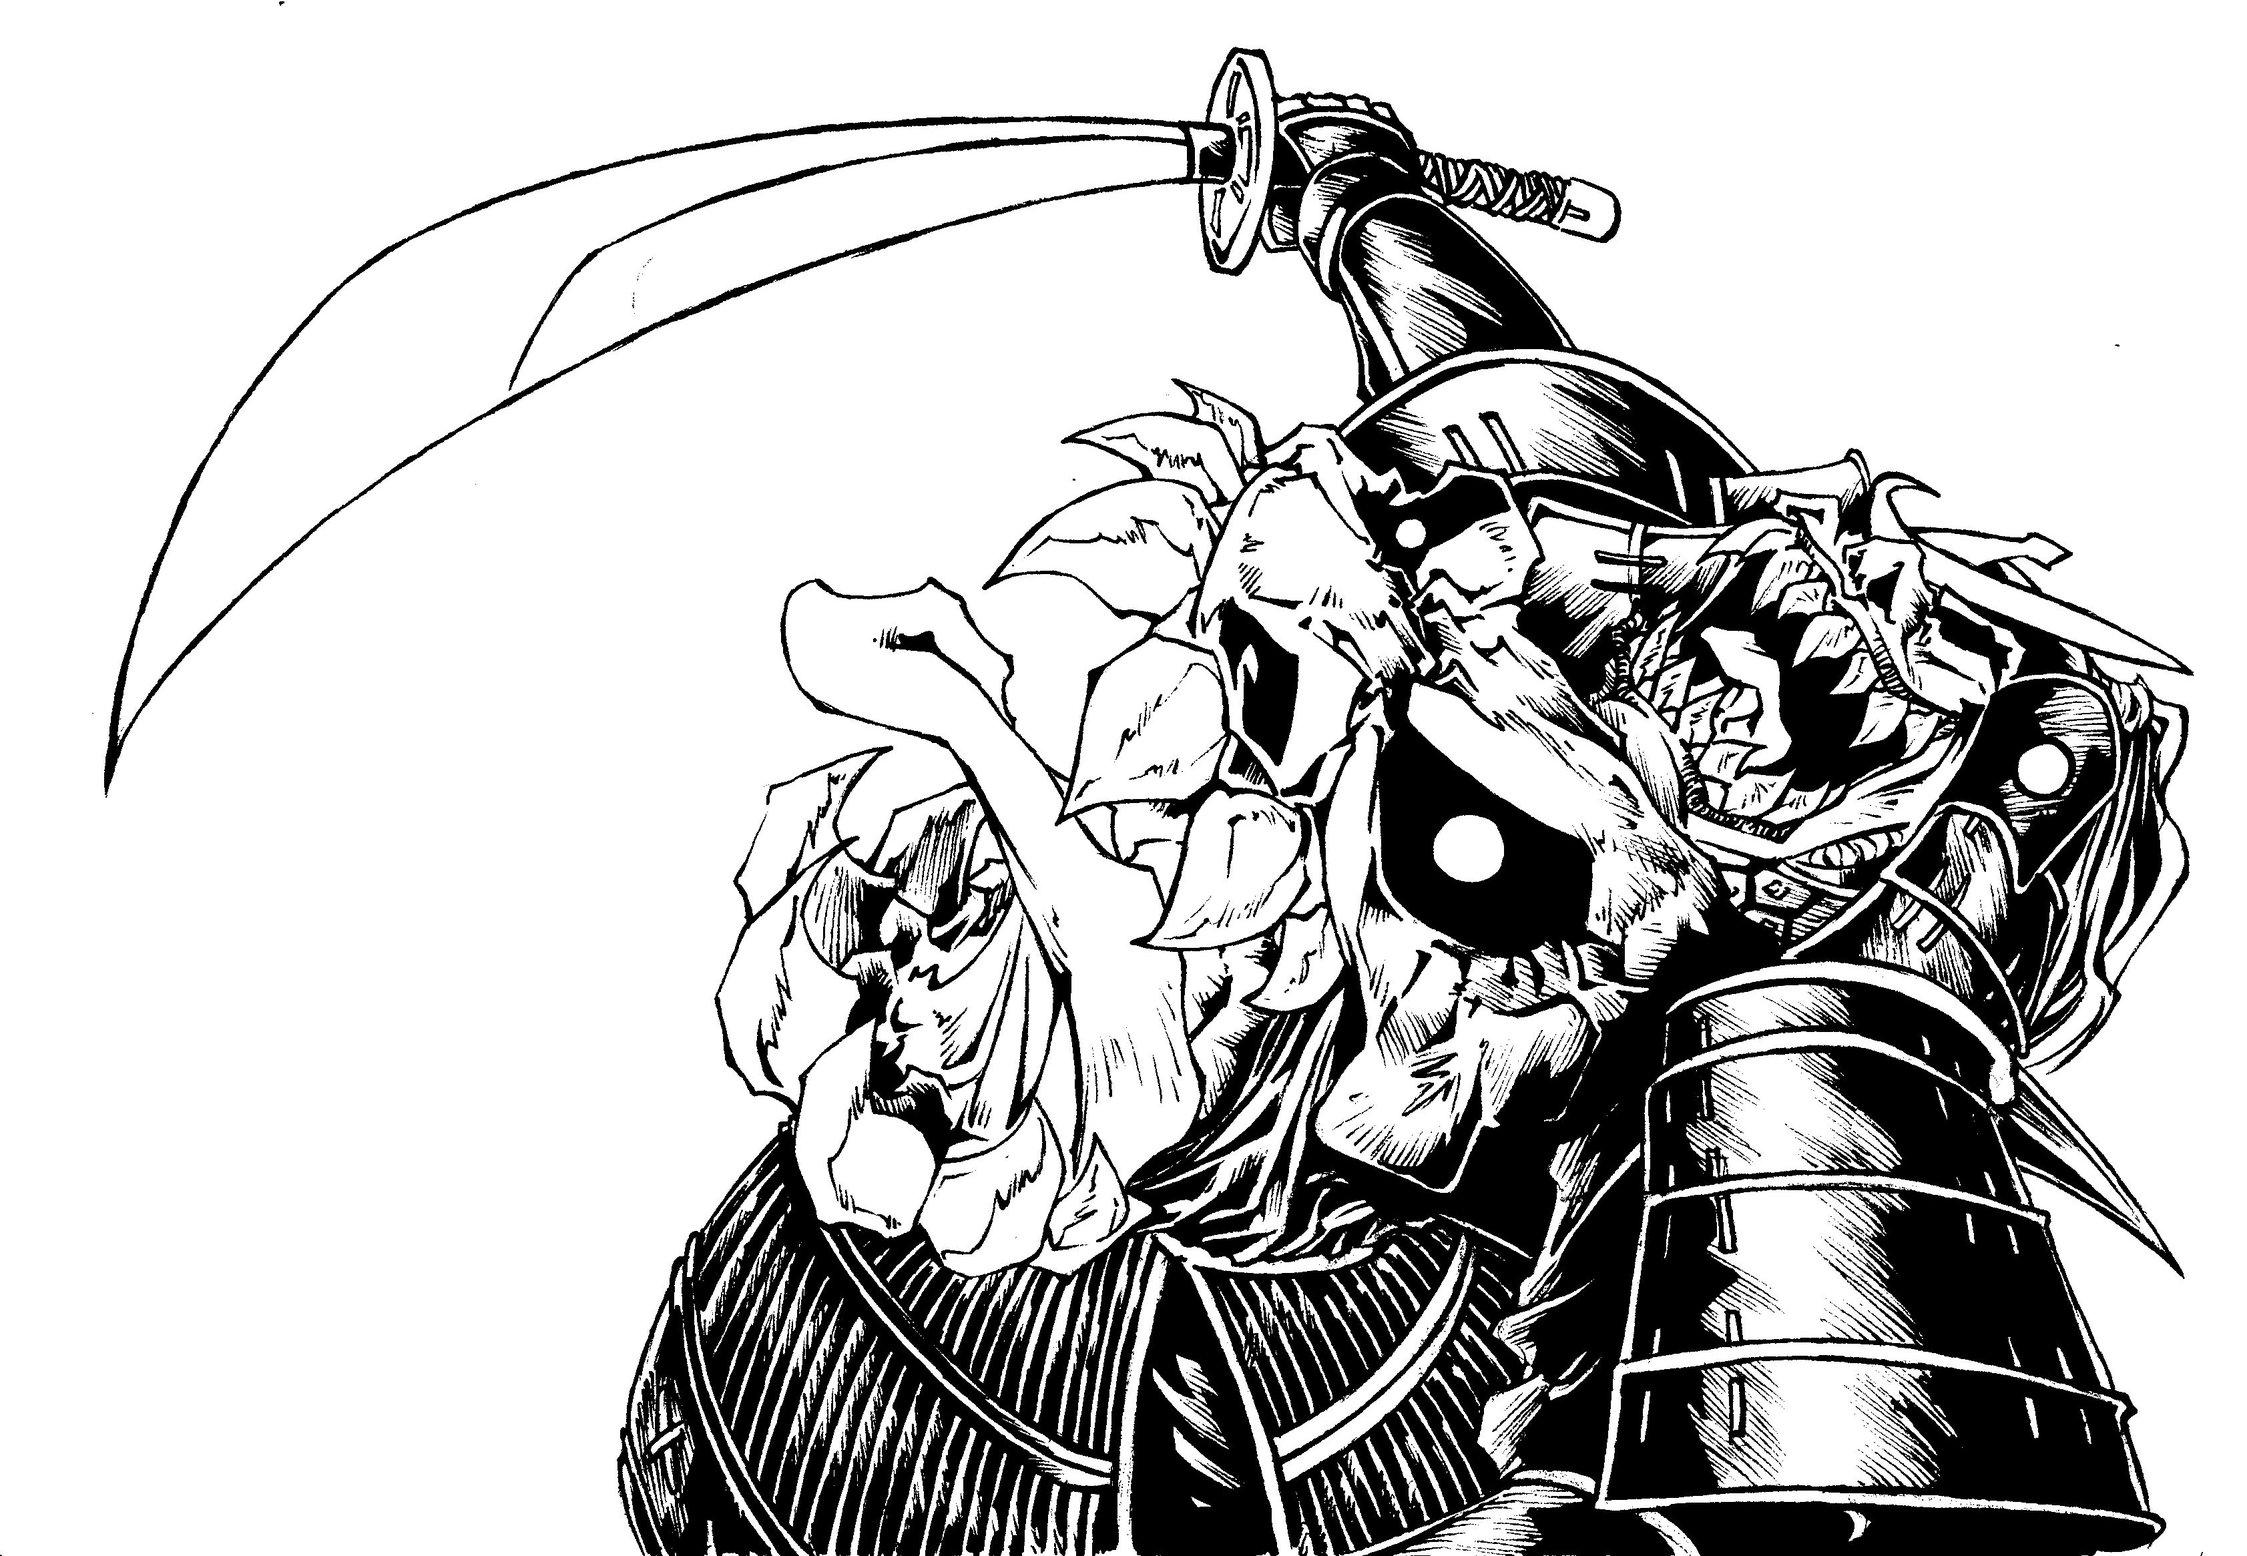 Drawn samurai demonic Revised Bishamon Samurai Demon revised